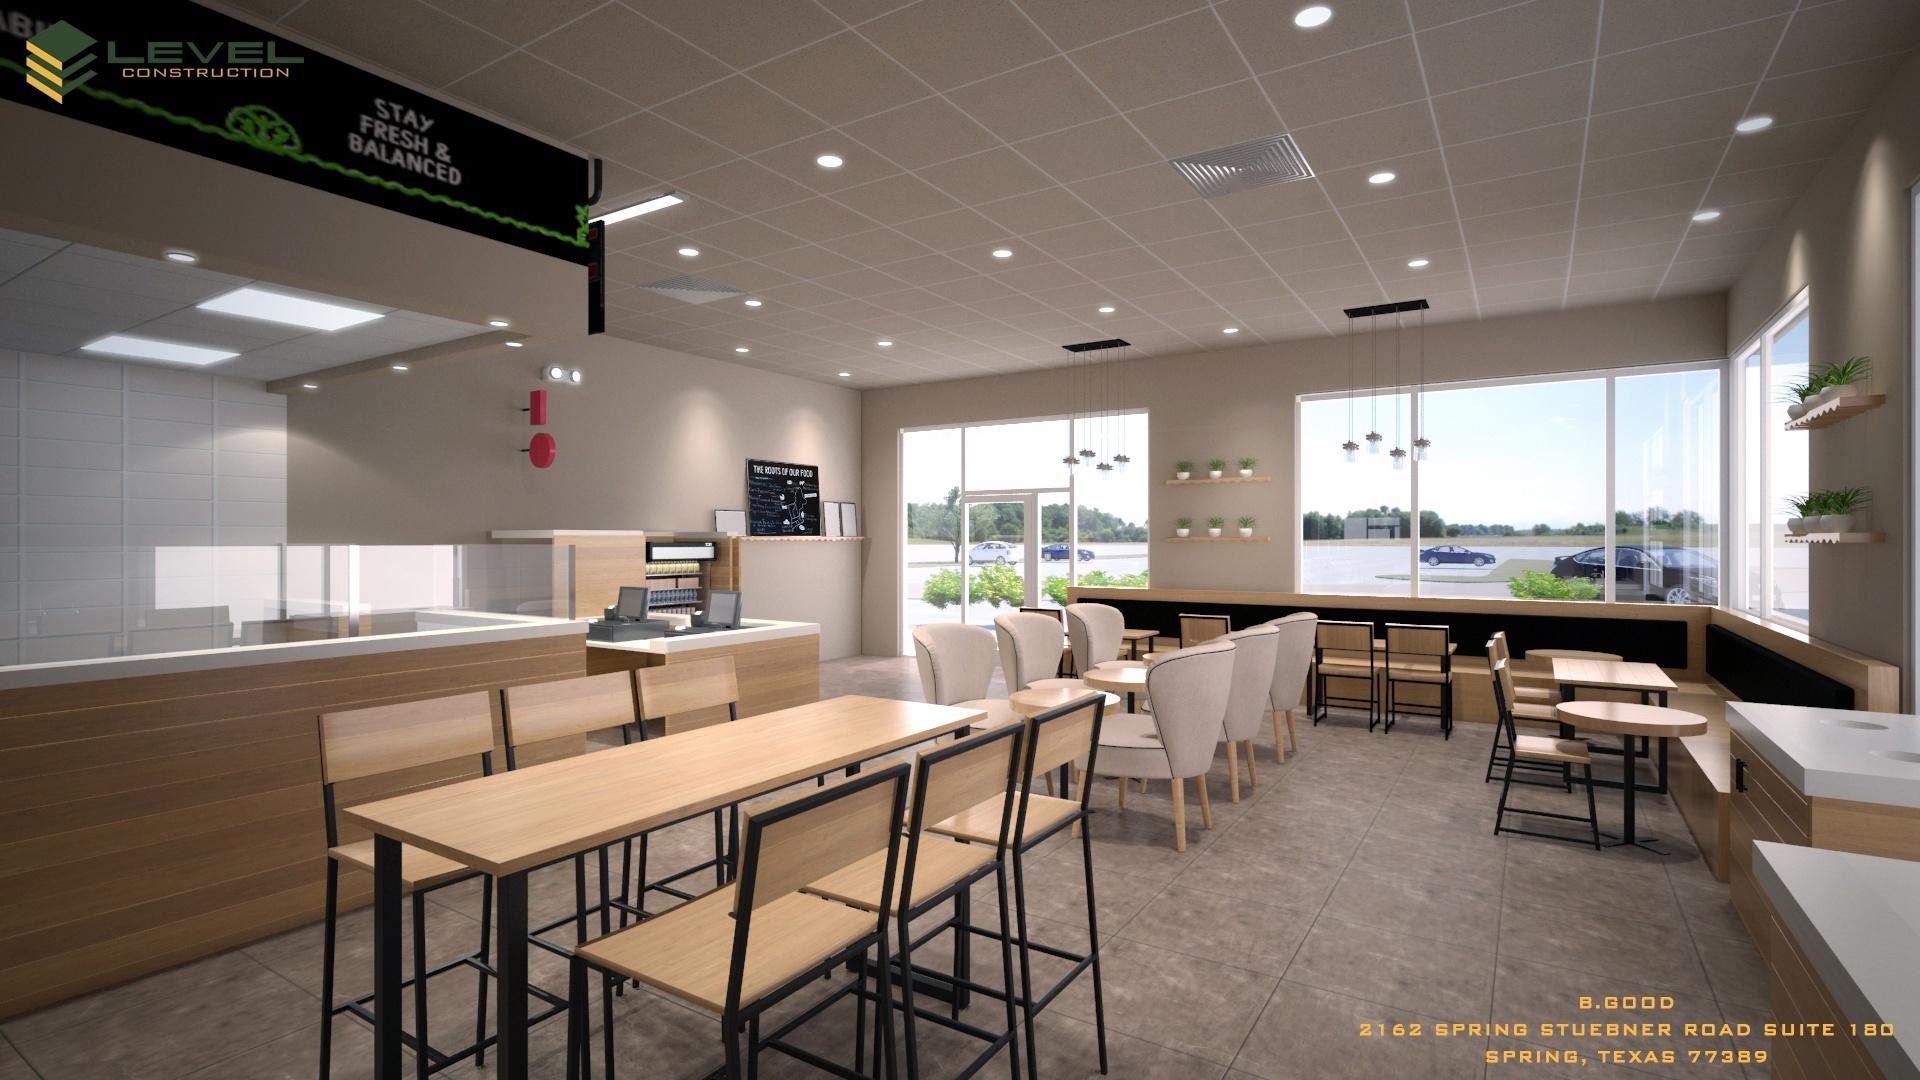 BGOOD rendering of inside store